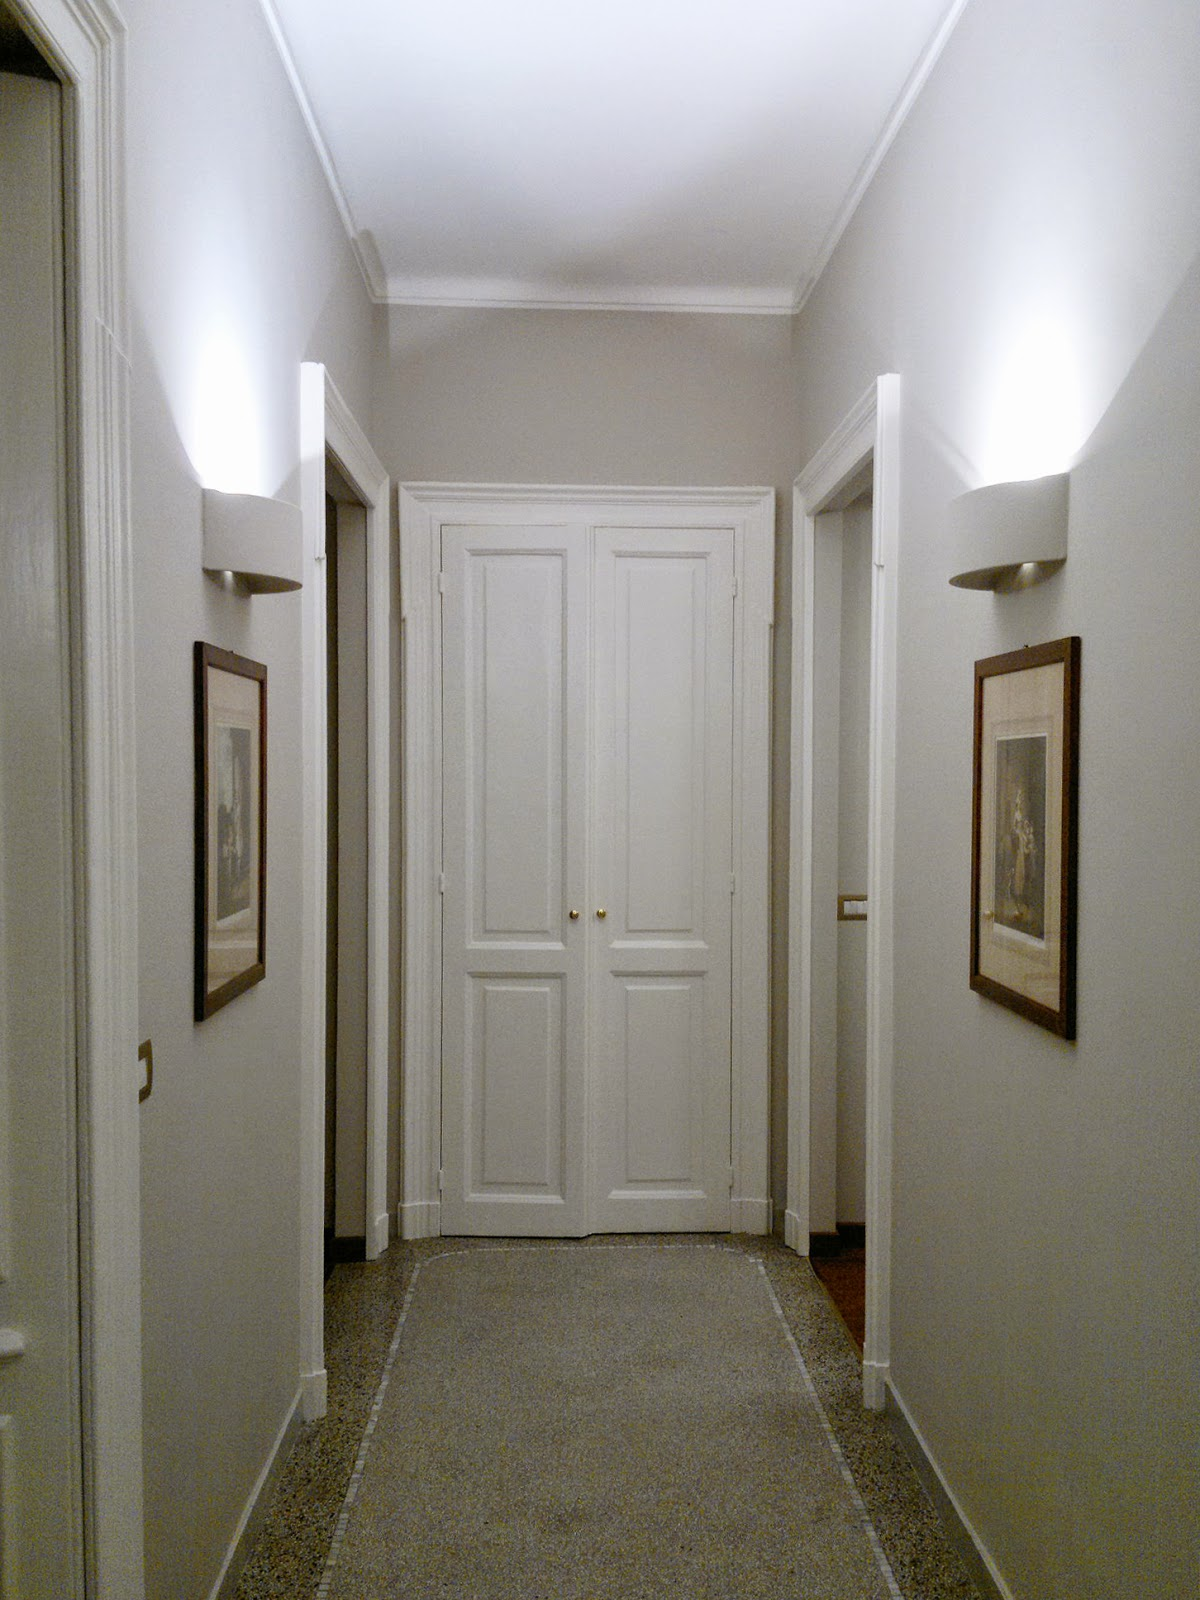 Illuminazione Led casa gennaio 2015